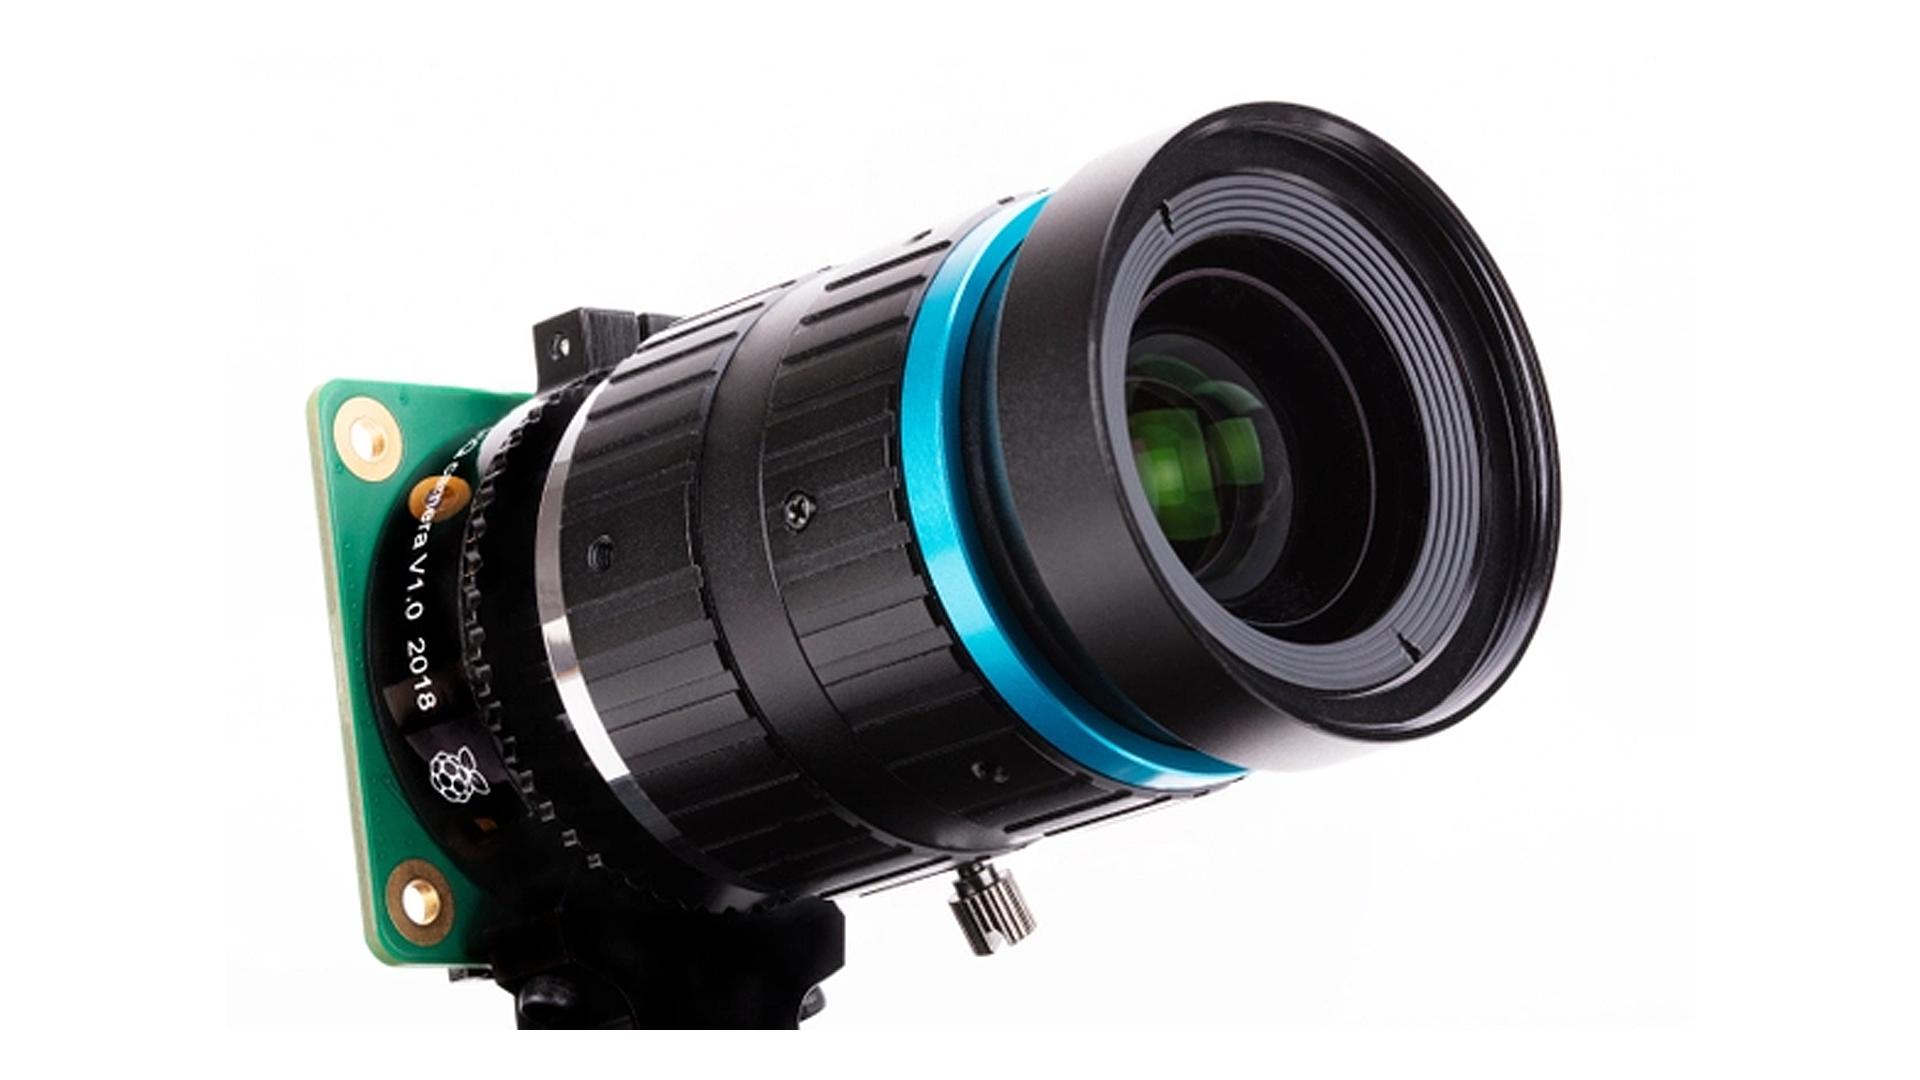 A photo of the high-quality Pi camera module.